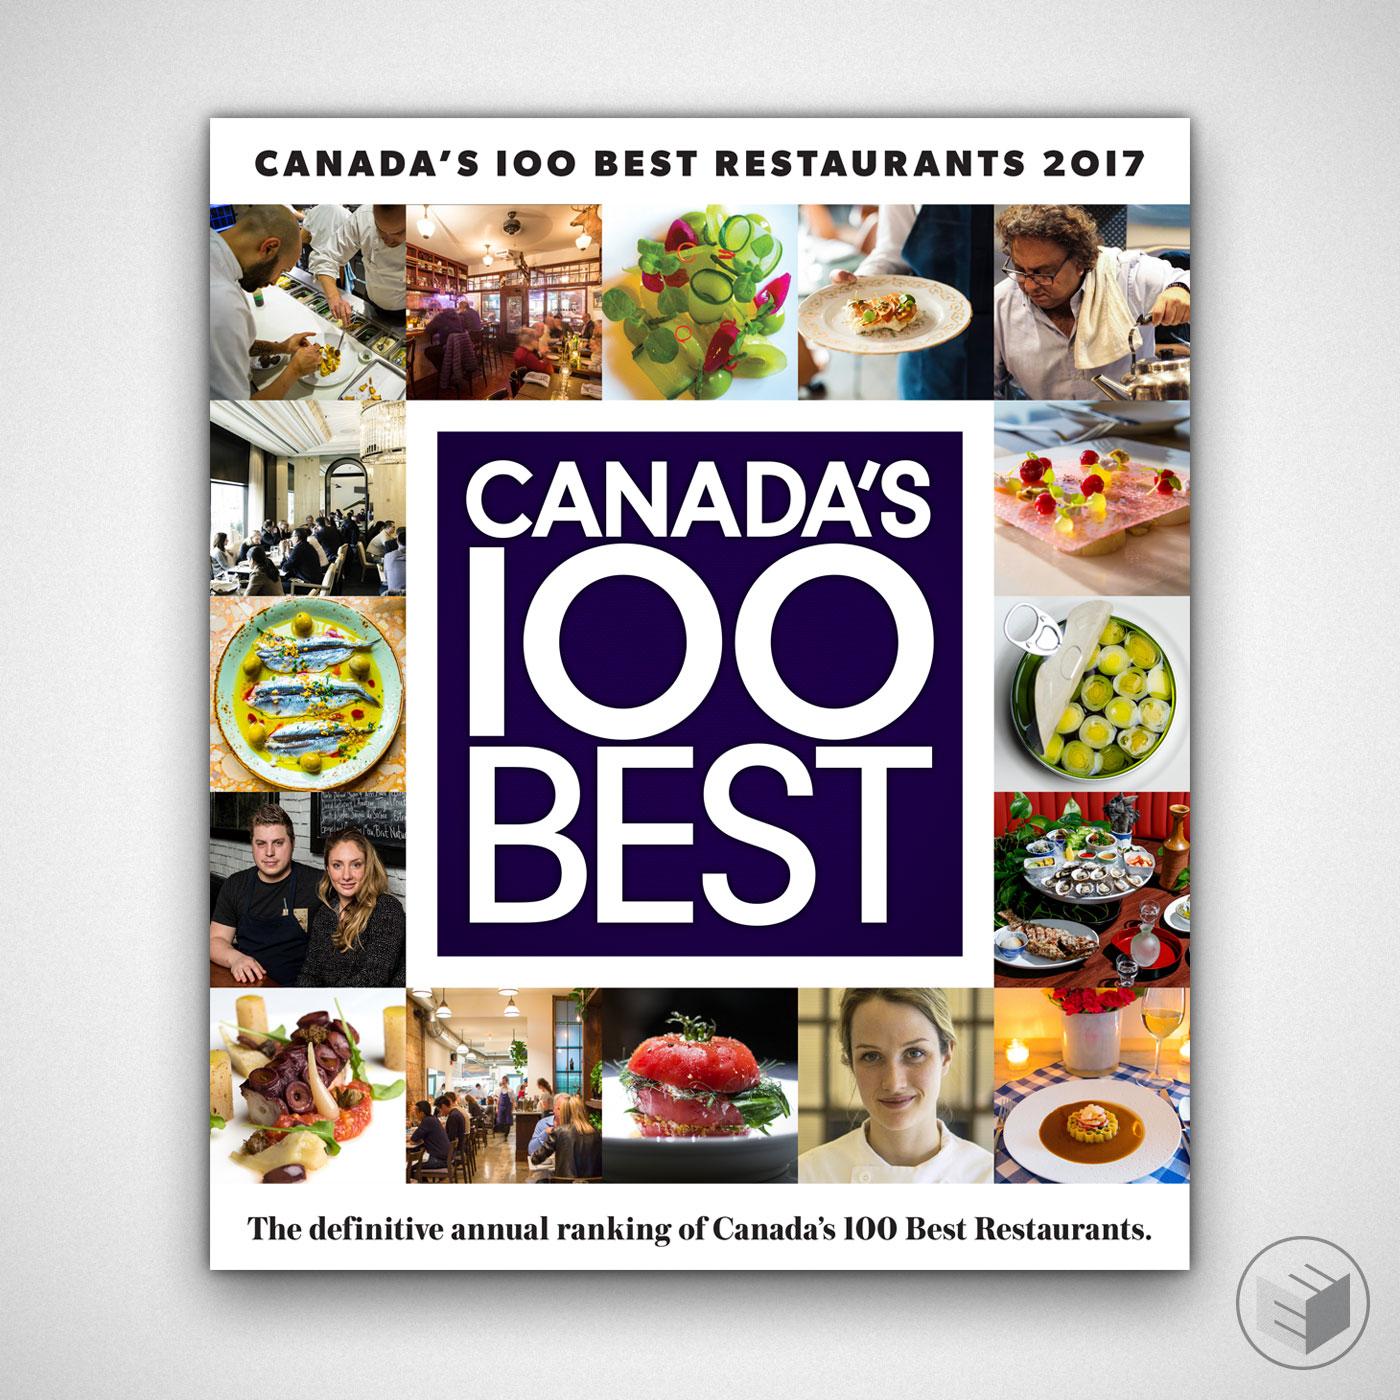 CANADA'S 100 BEST RESTAURANTS 2017 COVER